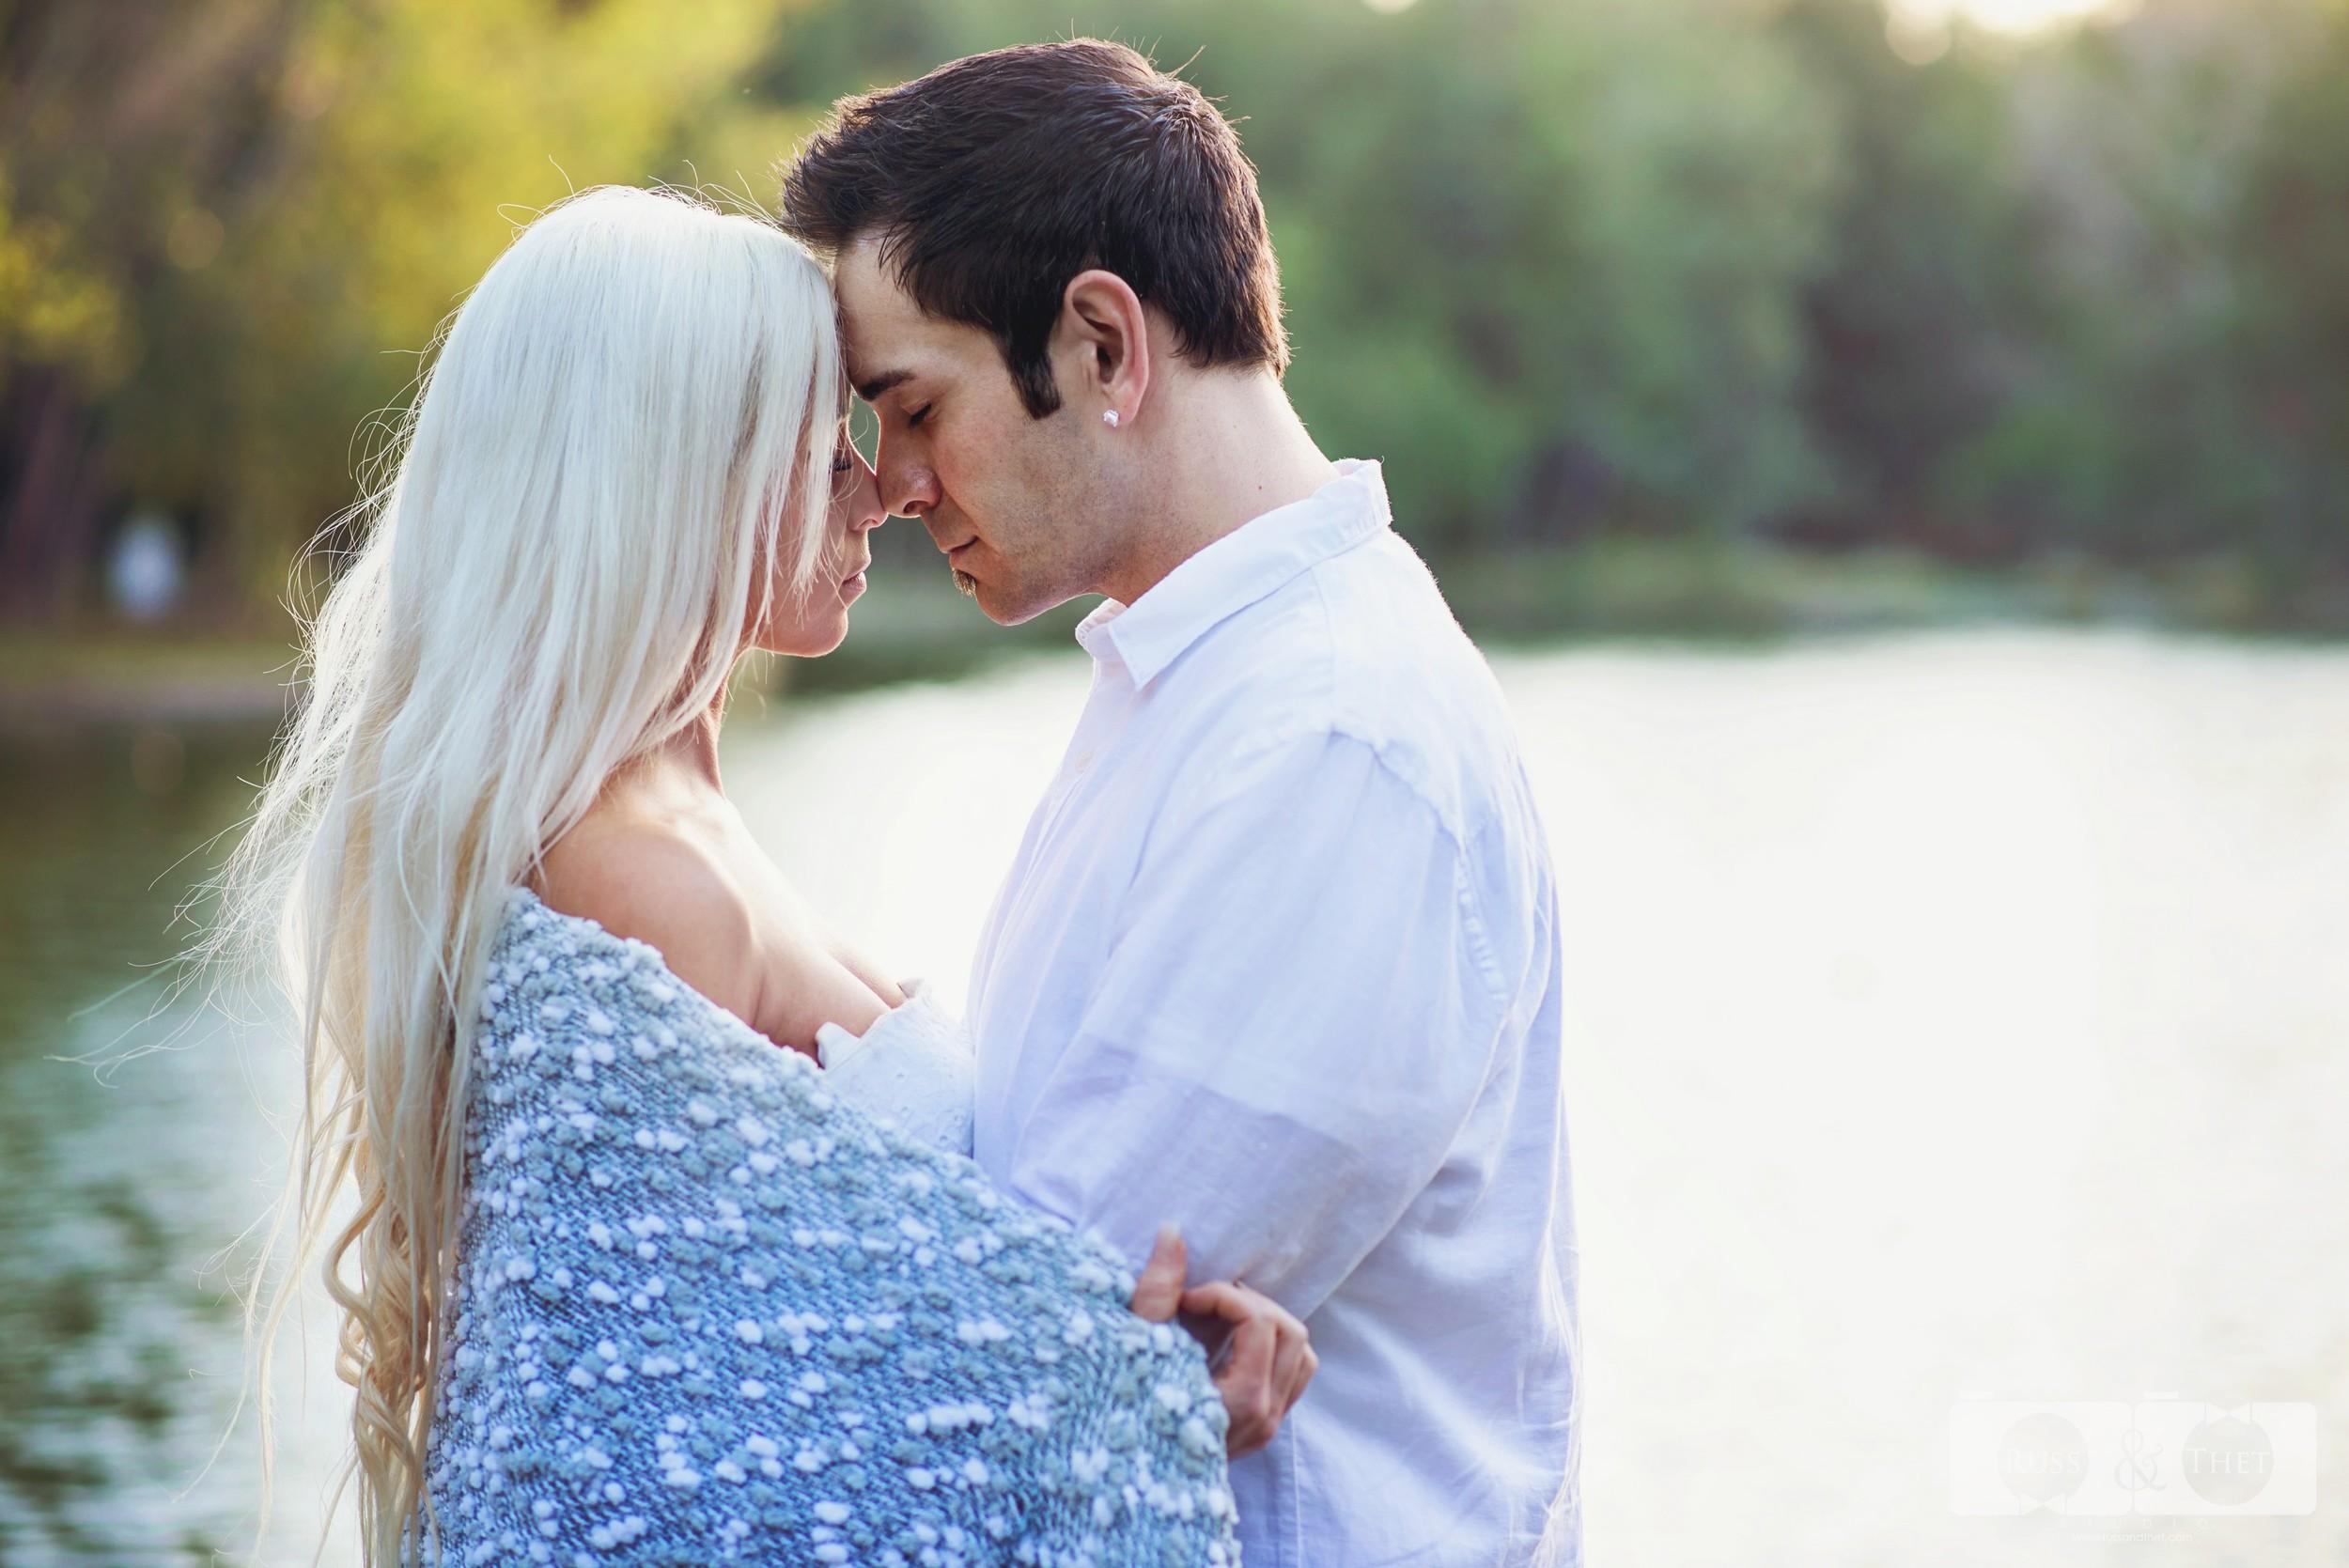 Jon&Kimee-Orange-County-Engagement-Photographer (5).jpg